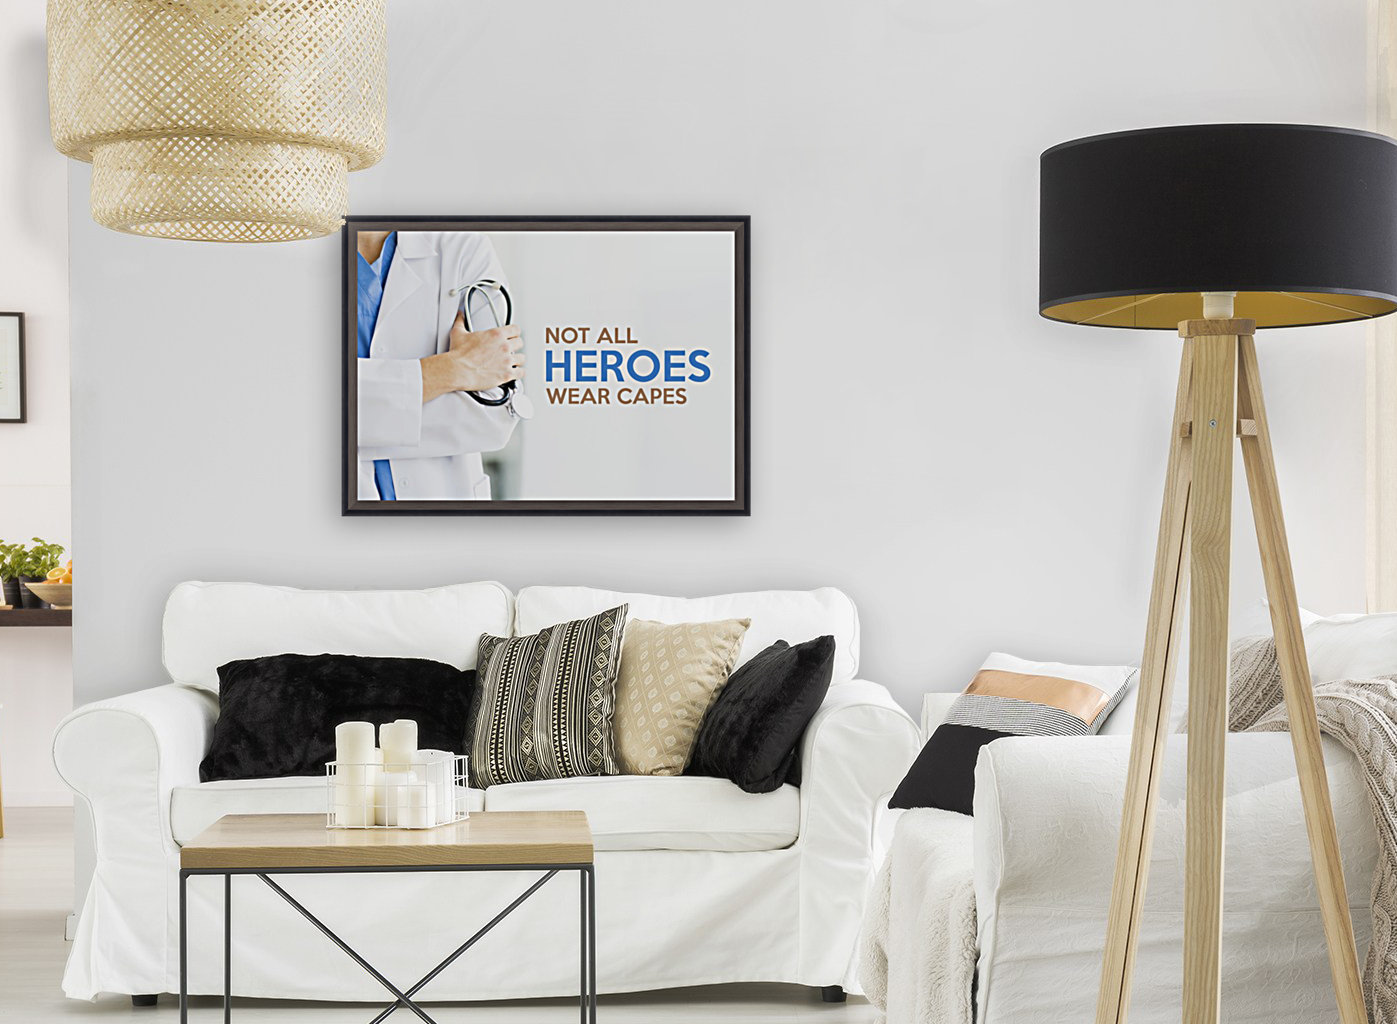 Not All Heroes Wear Capes Motivational Wall Art  Art